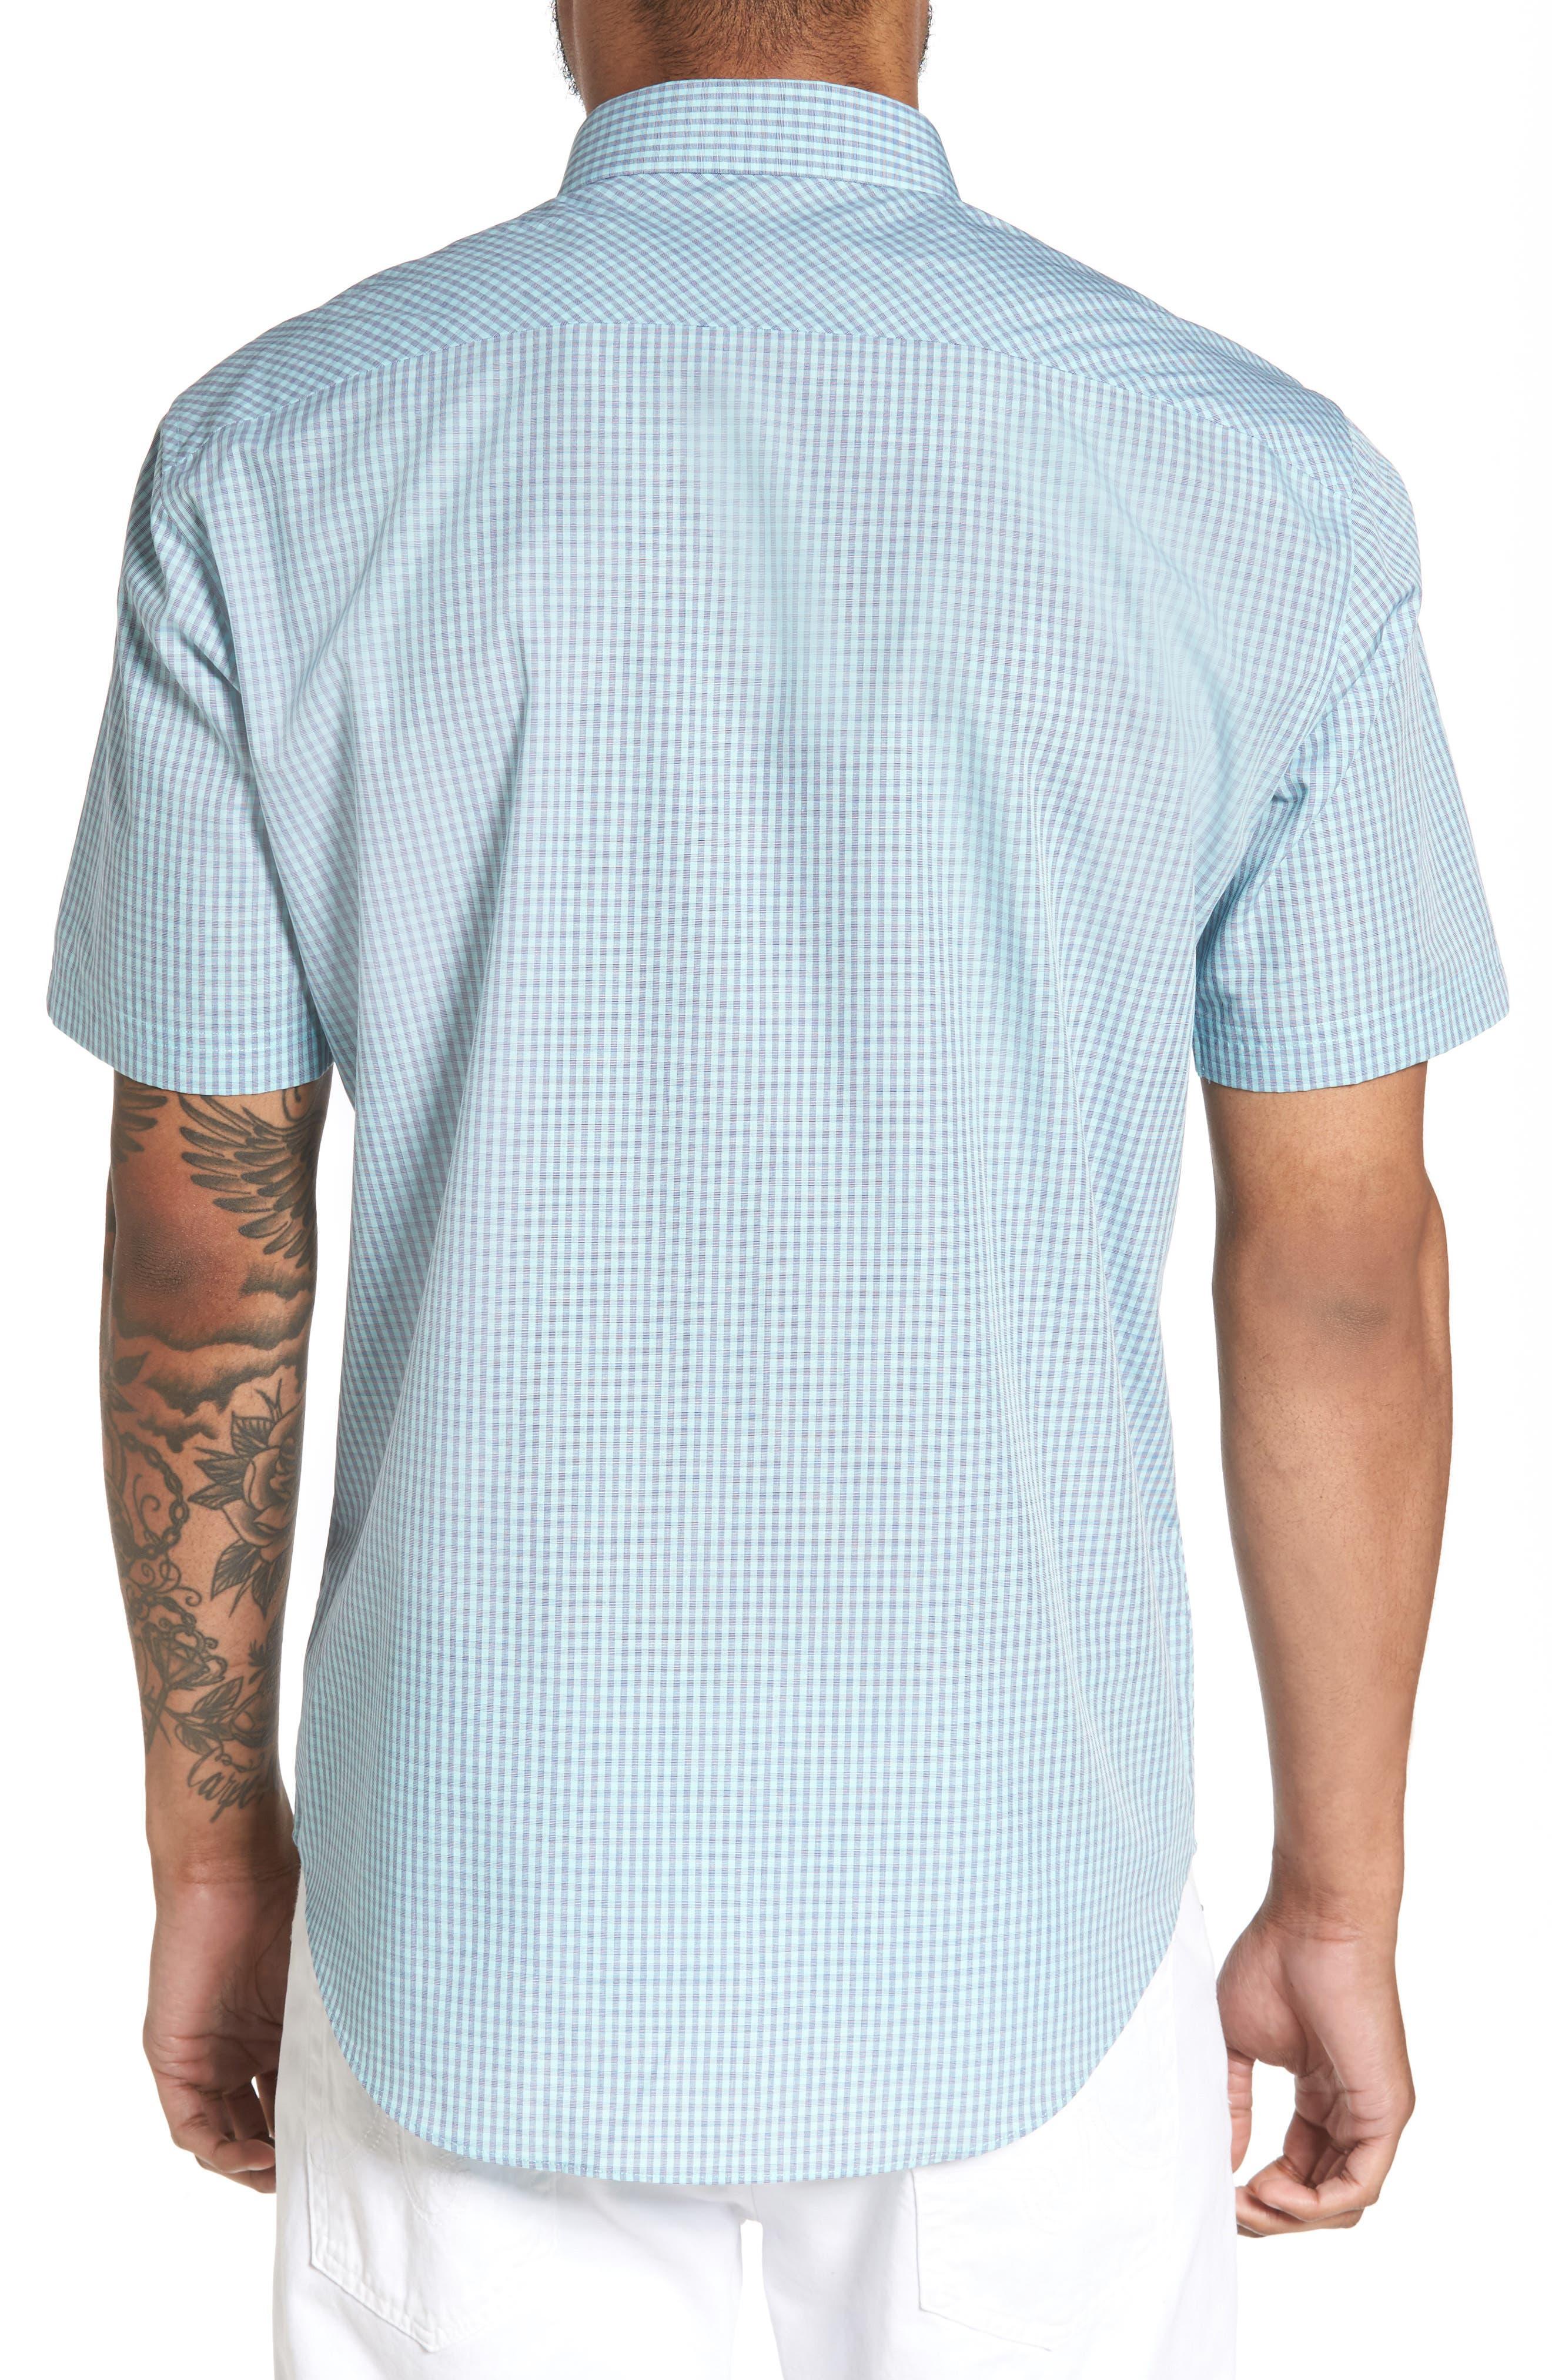 Rappaport Sport Shirt,                             Alternate thumbnail 2, color,                             332